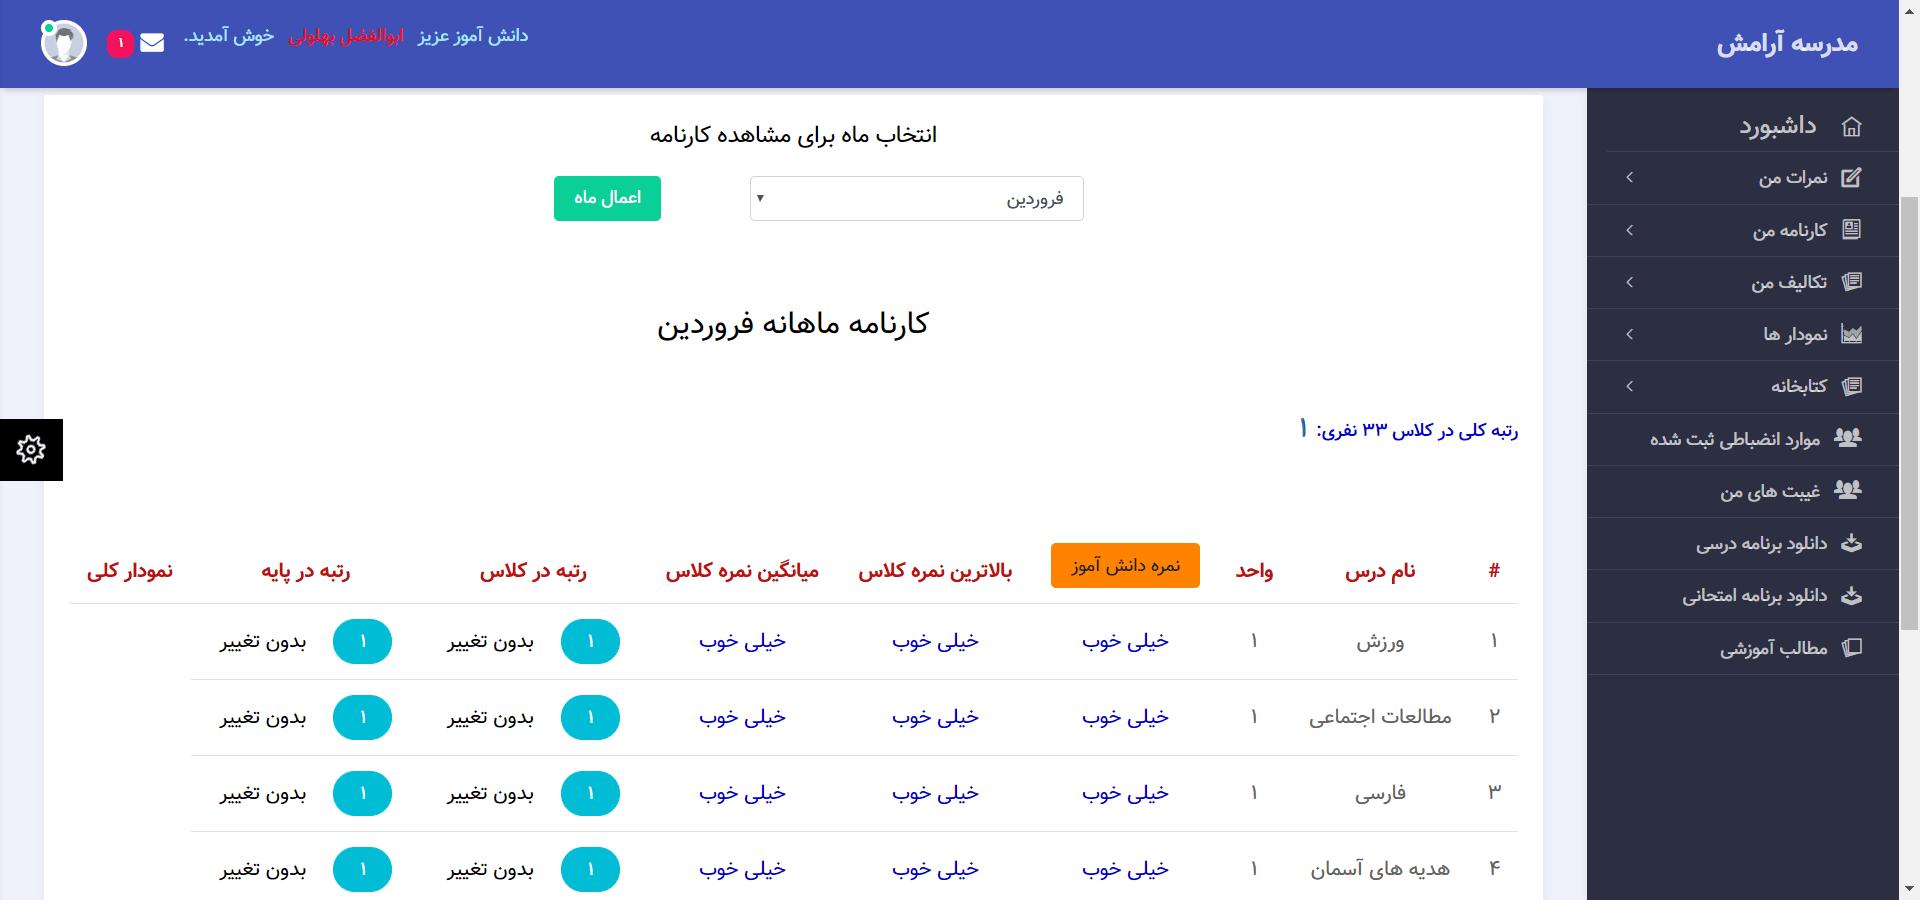 اسکریپت MySchool | اسکریپت حرفه ای مدیریت مدرسه مجازی